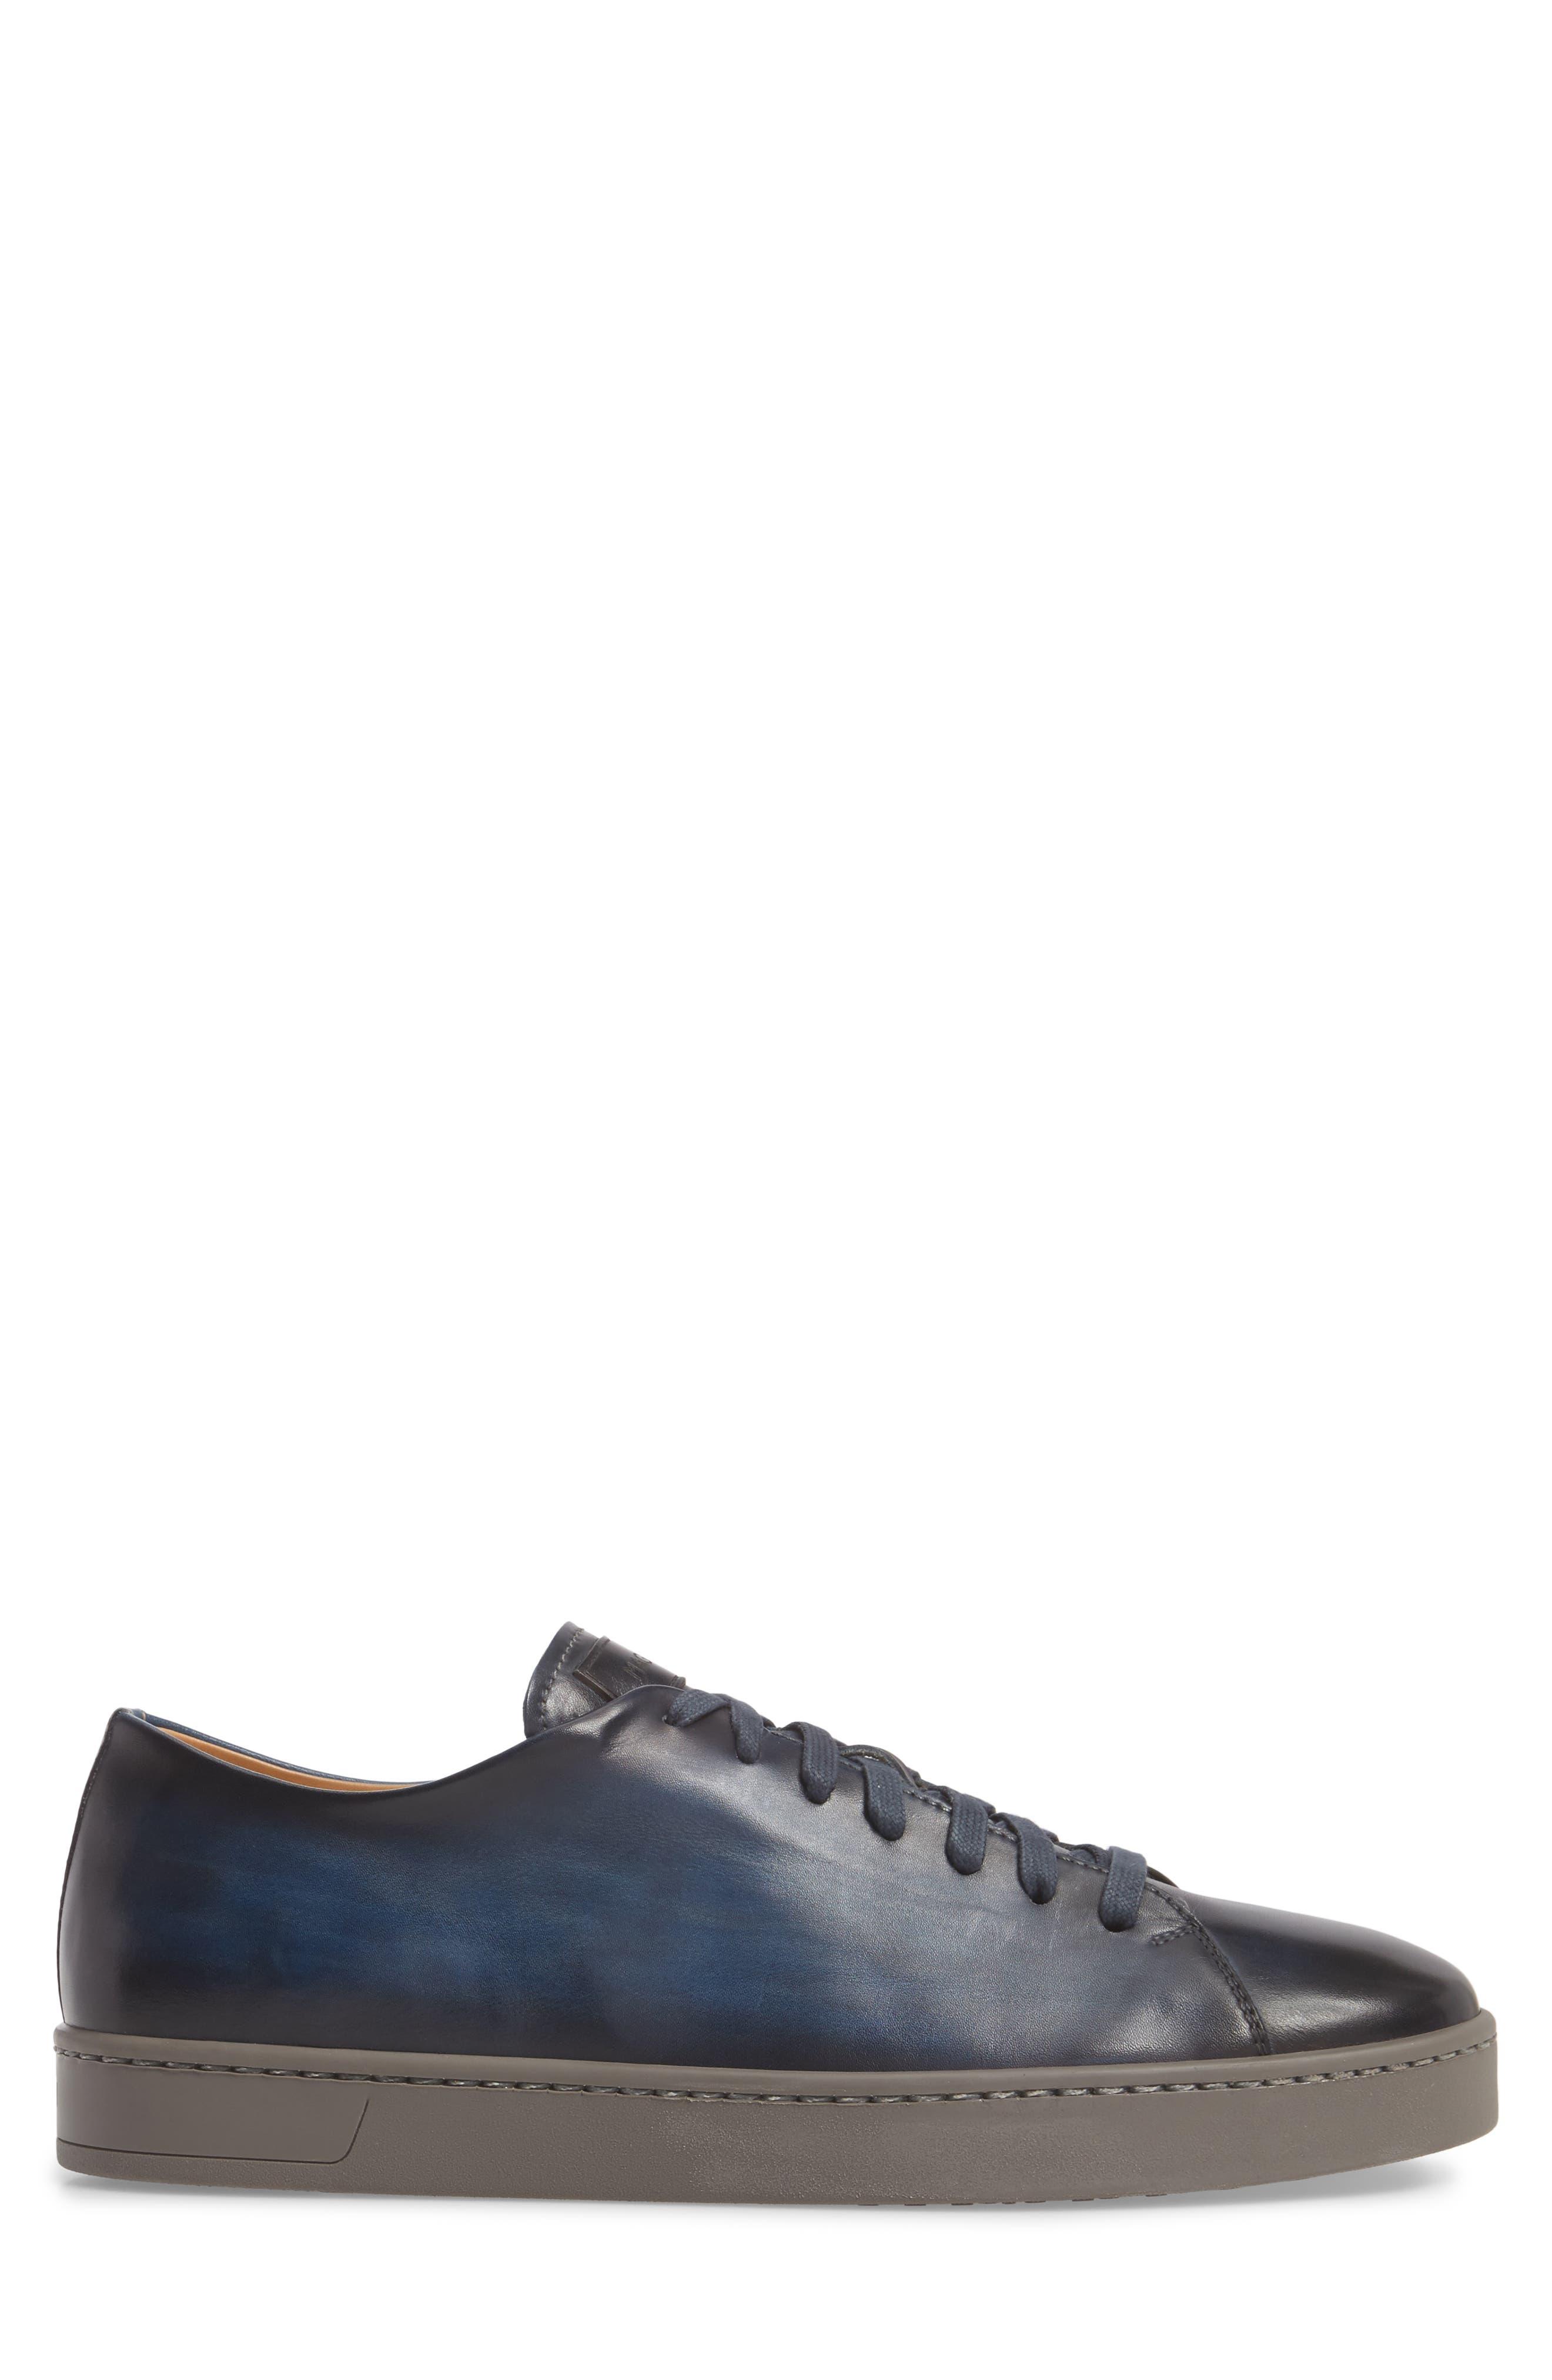 Belmont Lo Sneaker,                             Alternate thumbnail 3, color,                             NAVY LEATHER